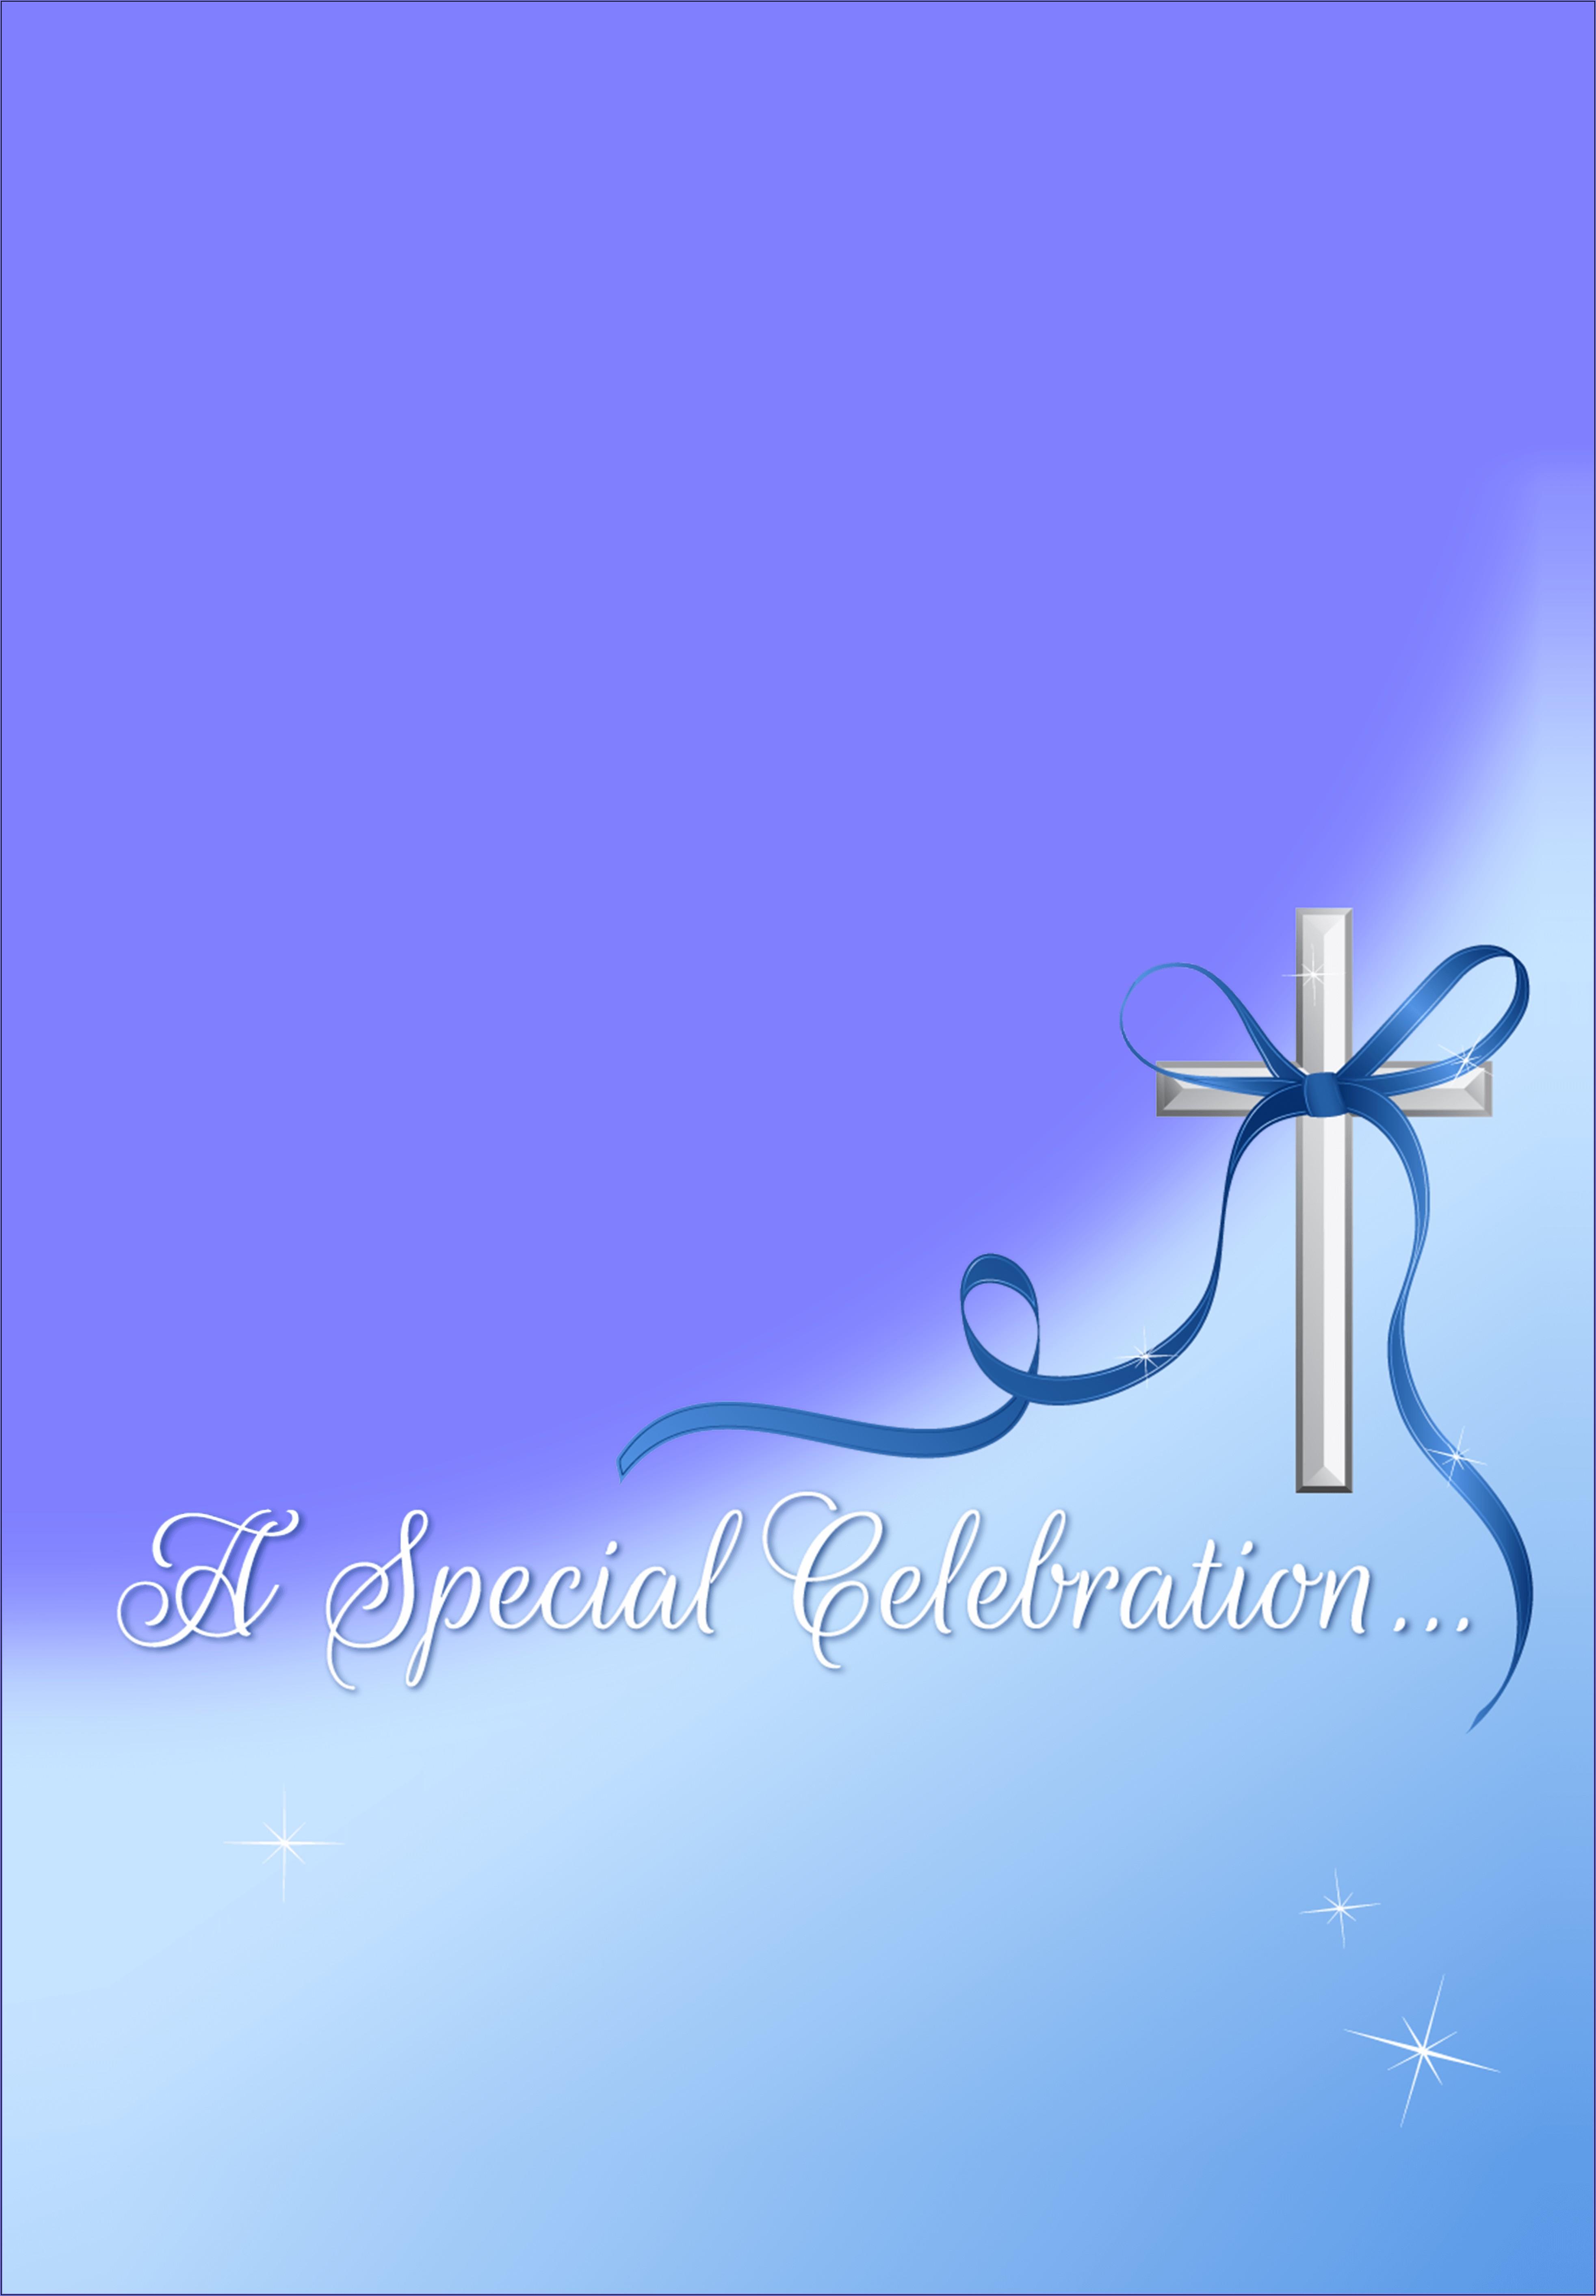 Baptism Invitation Background For Boy